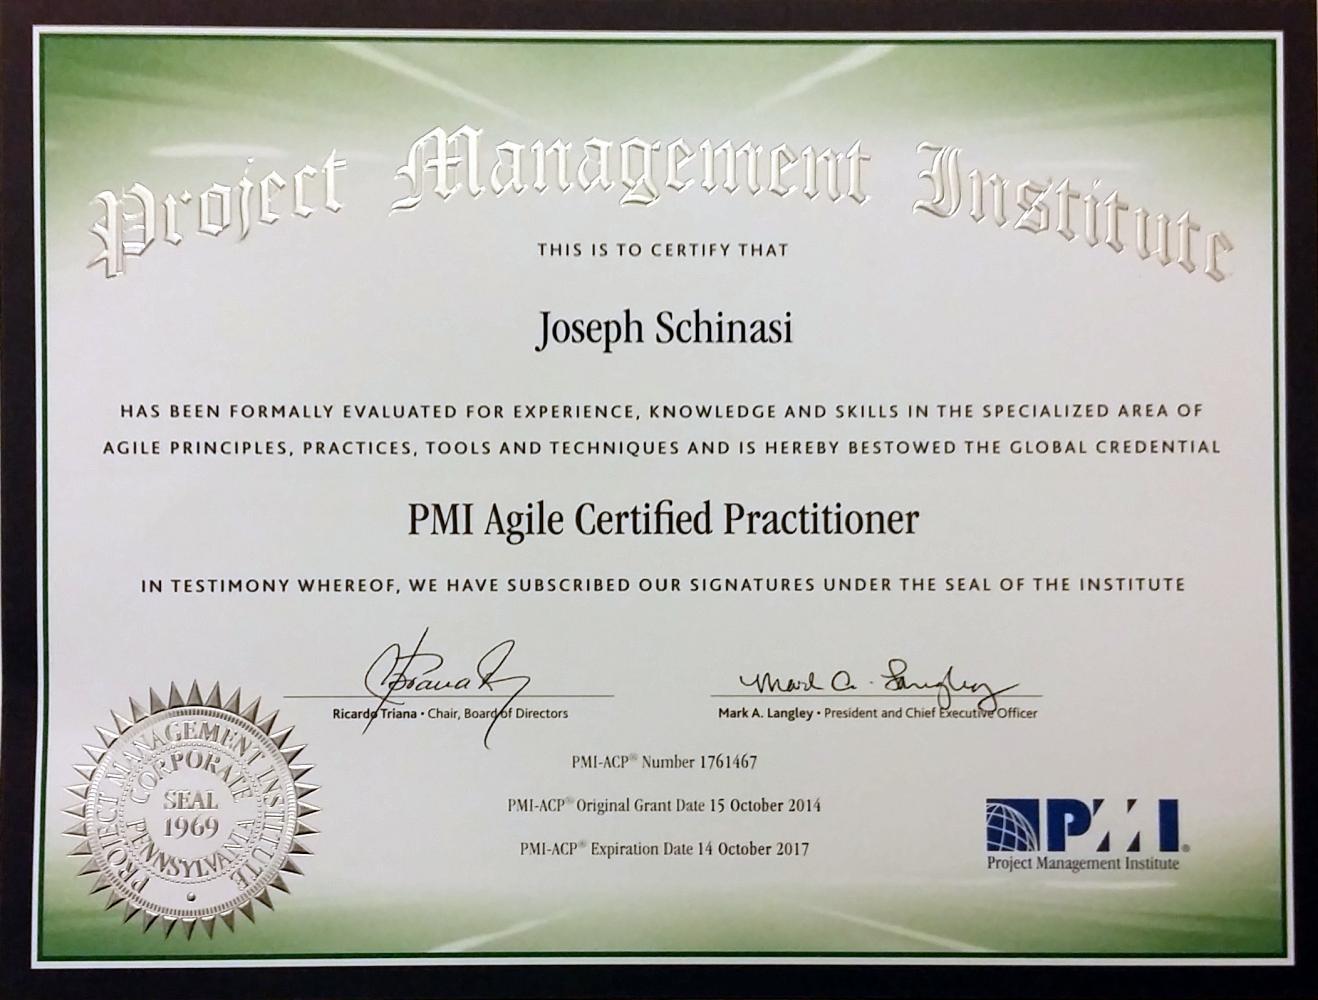 Agilecertvfg agile certified practitioner 1betcityfo Images